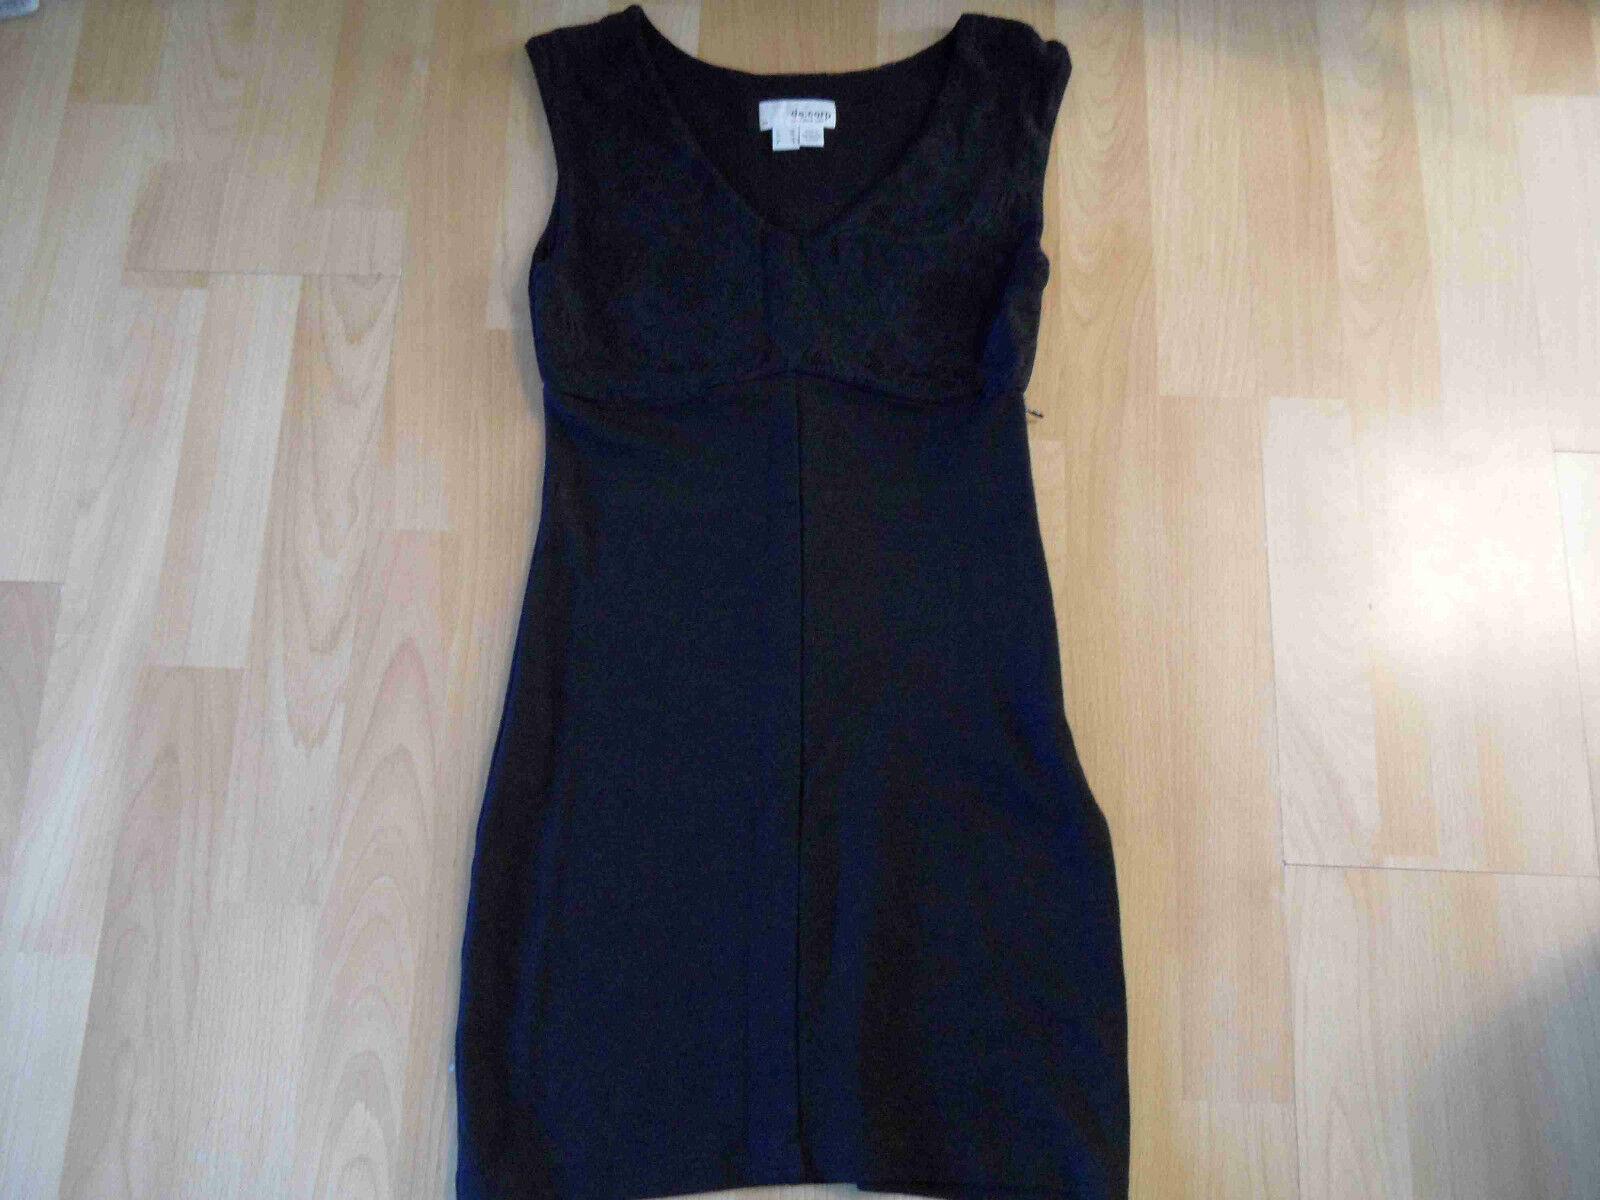 ESPRIT de Corp schmales Jerseykleid m. Spitze black Gr. XS TOP kCE416